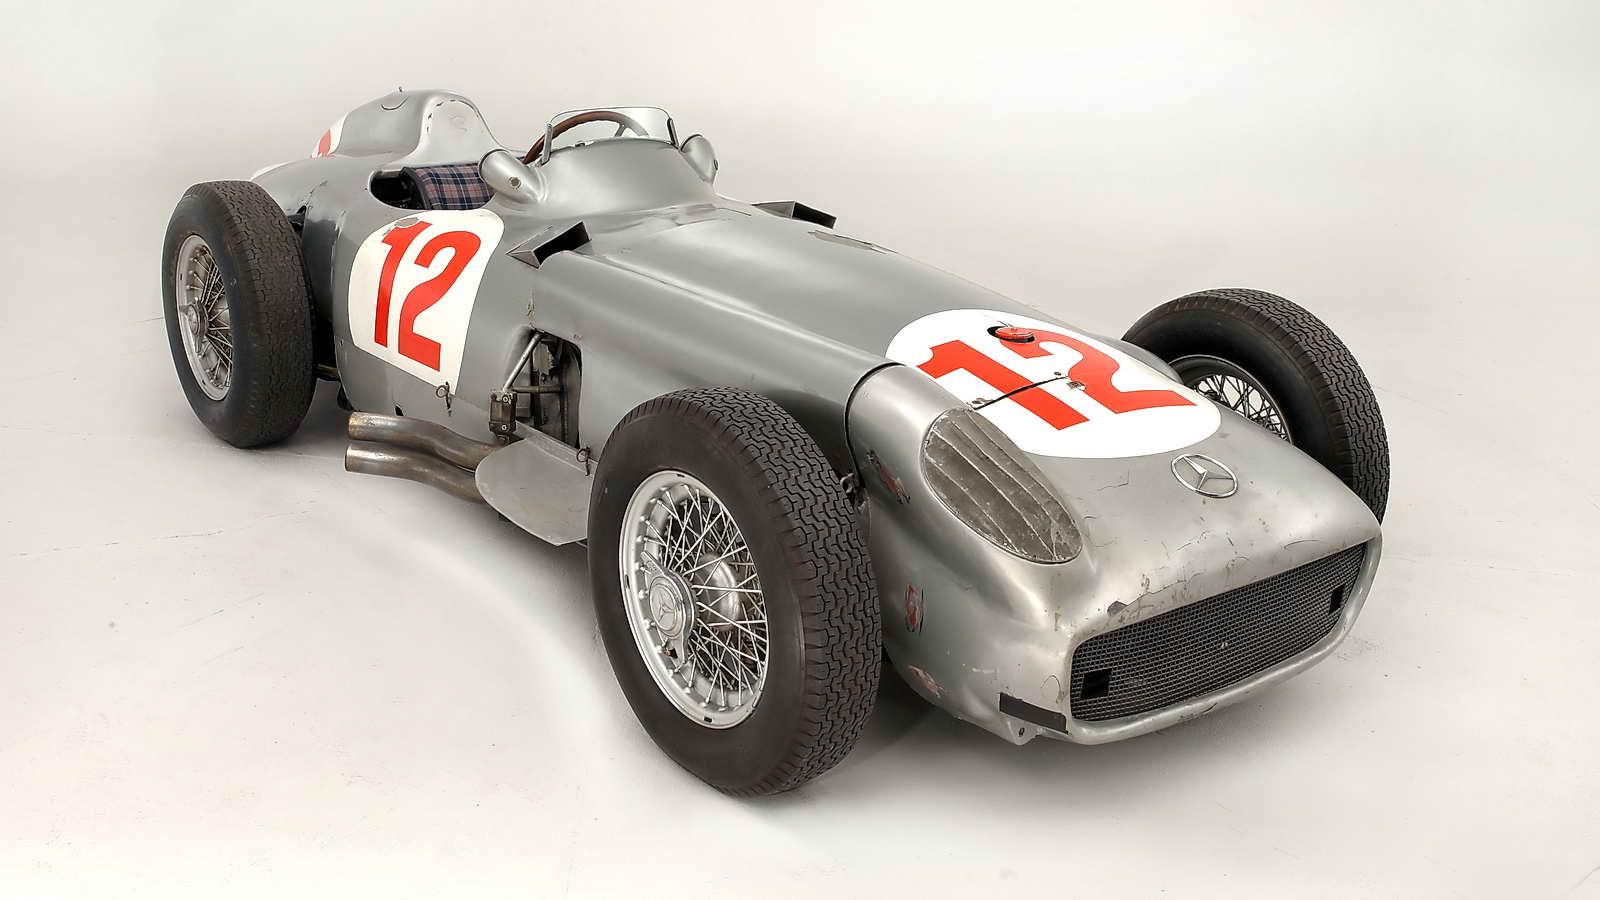 Mercedes_Benz_W196R_Formula_1_Racing_Single_Seater_1954_02